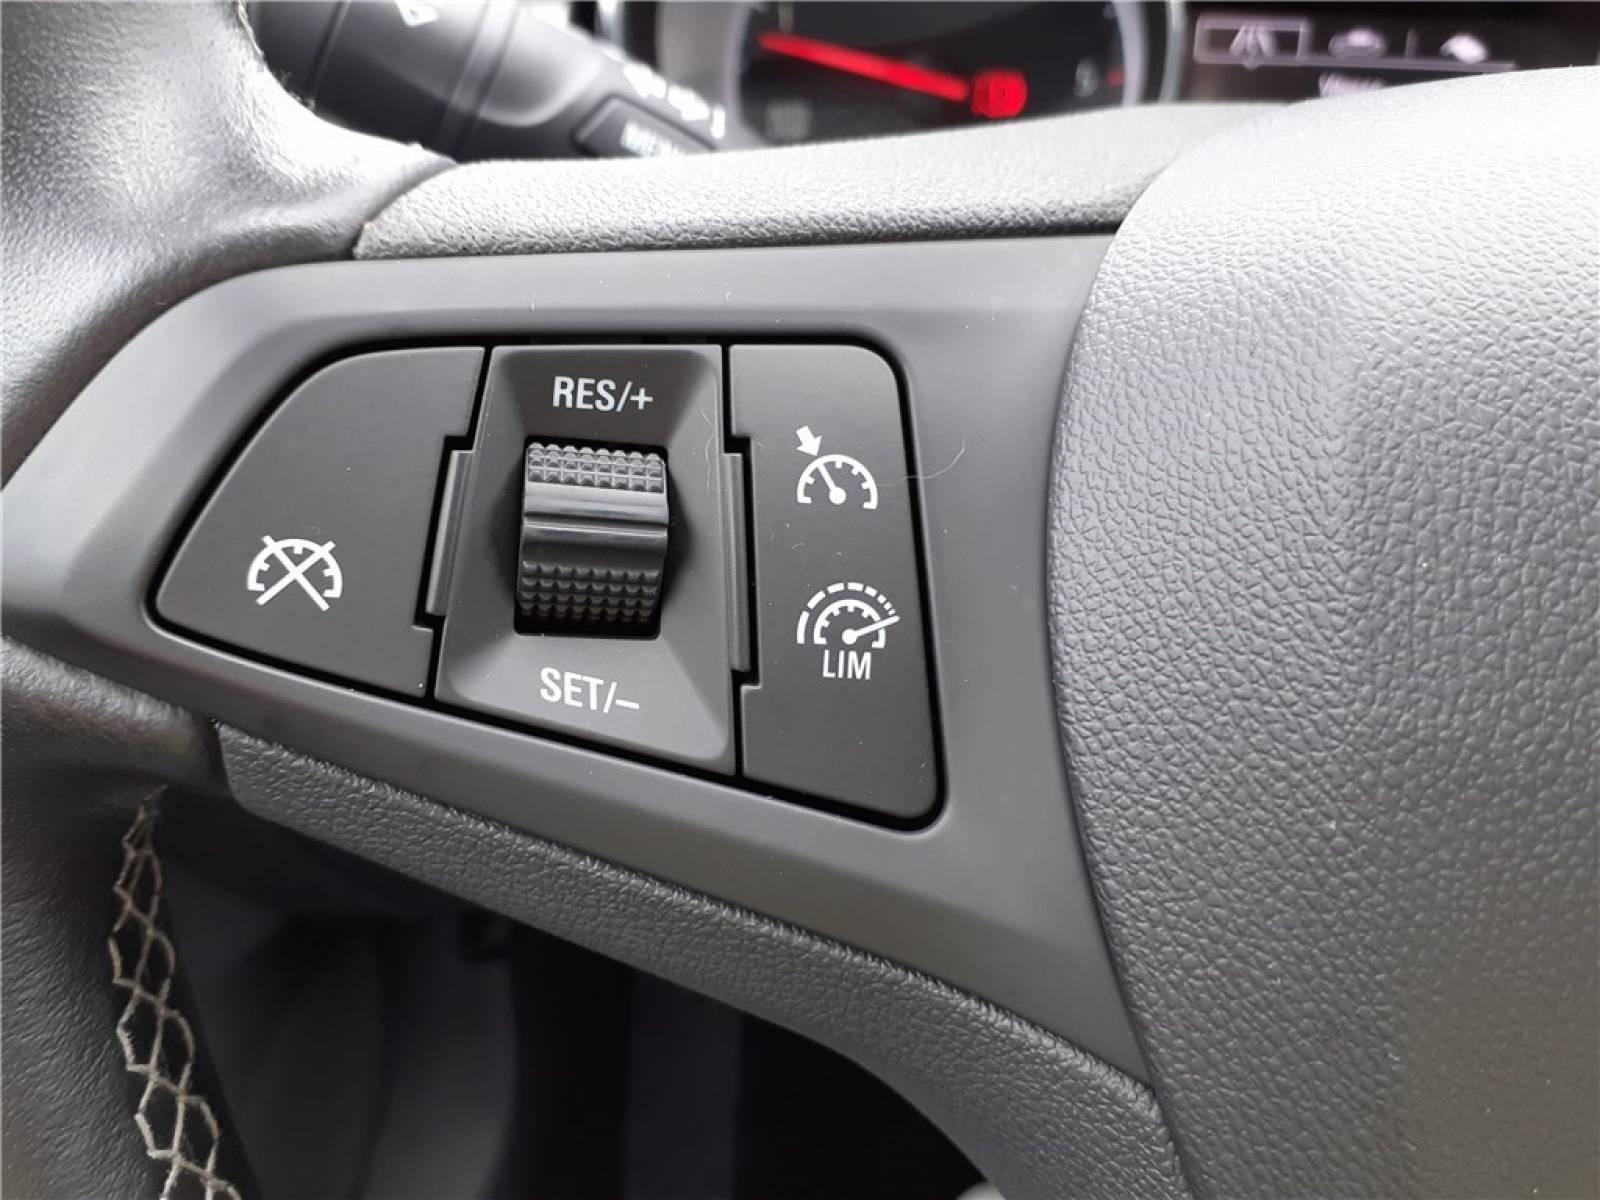 OPEL Astra Sports Tourer 1.6 CDTI 110 ch - véhicule d'occasion - Groupe Guillet - Opel Magicauto - Chalon-sur-Saône - 71380 - Saint-Marcel - 33